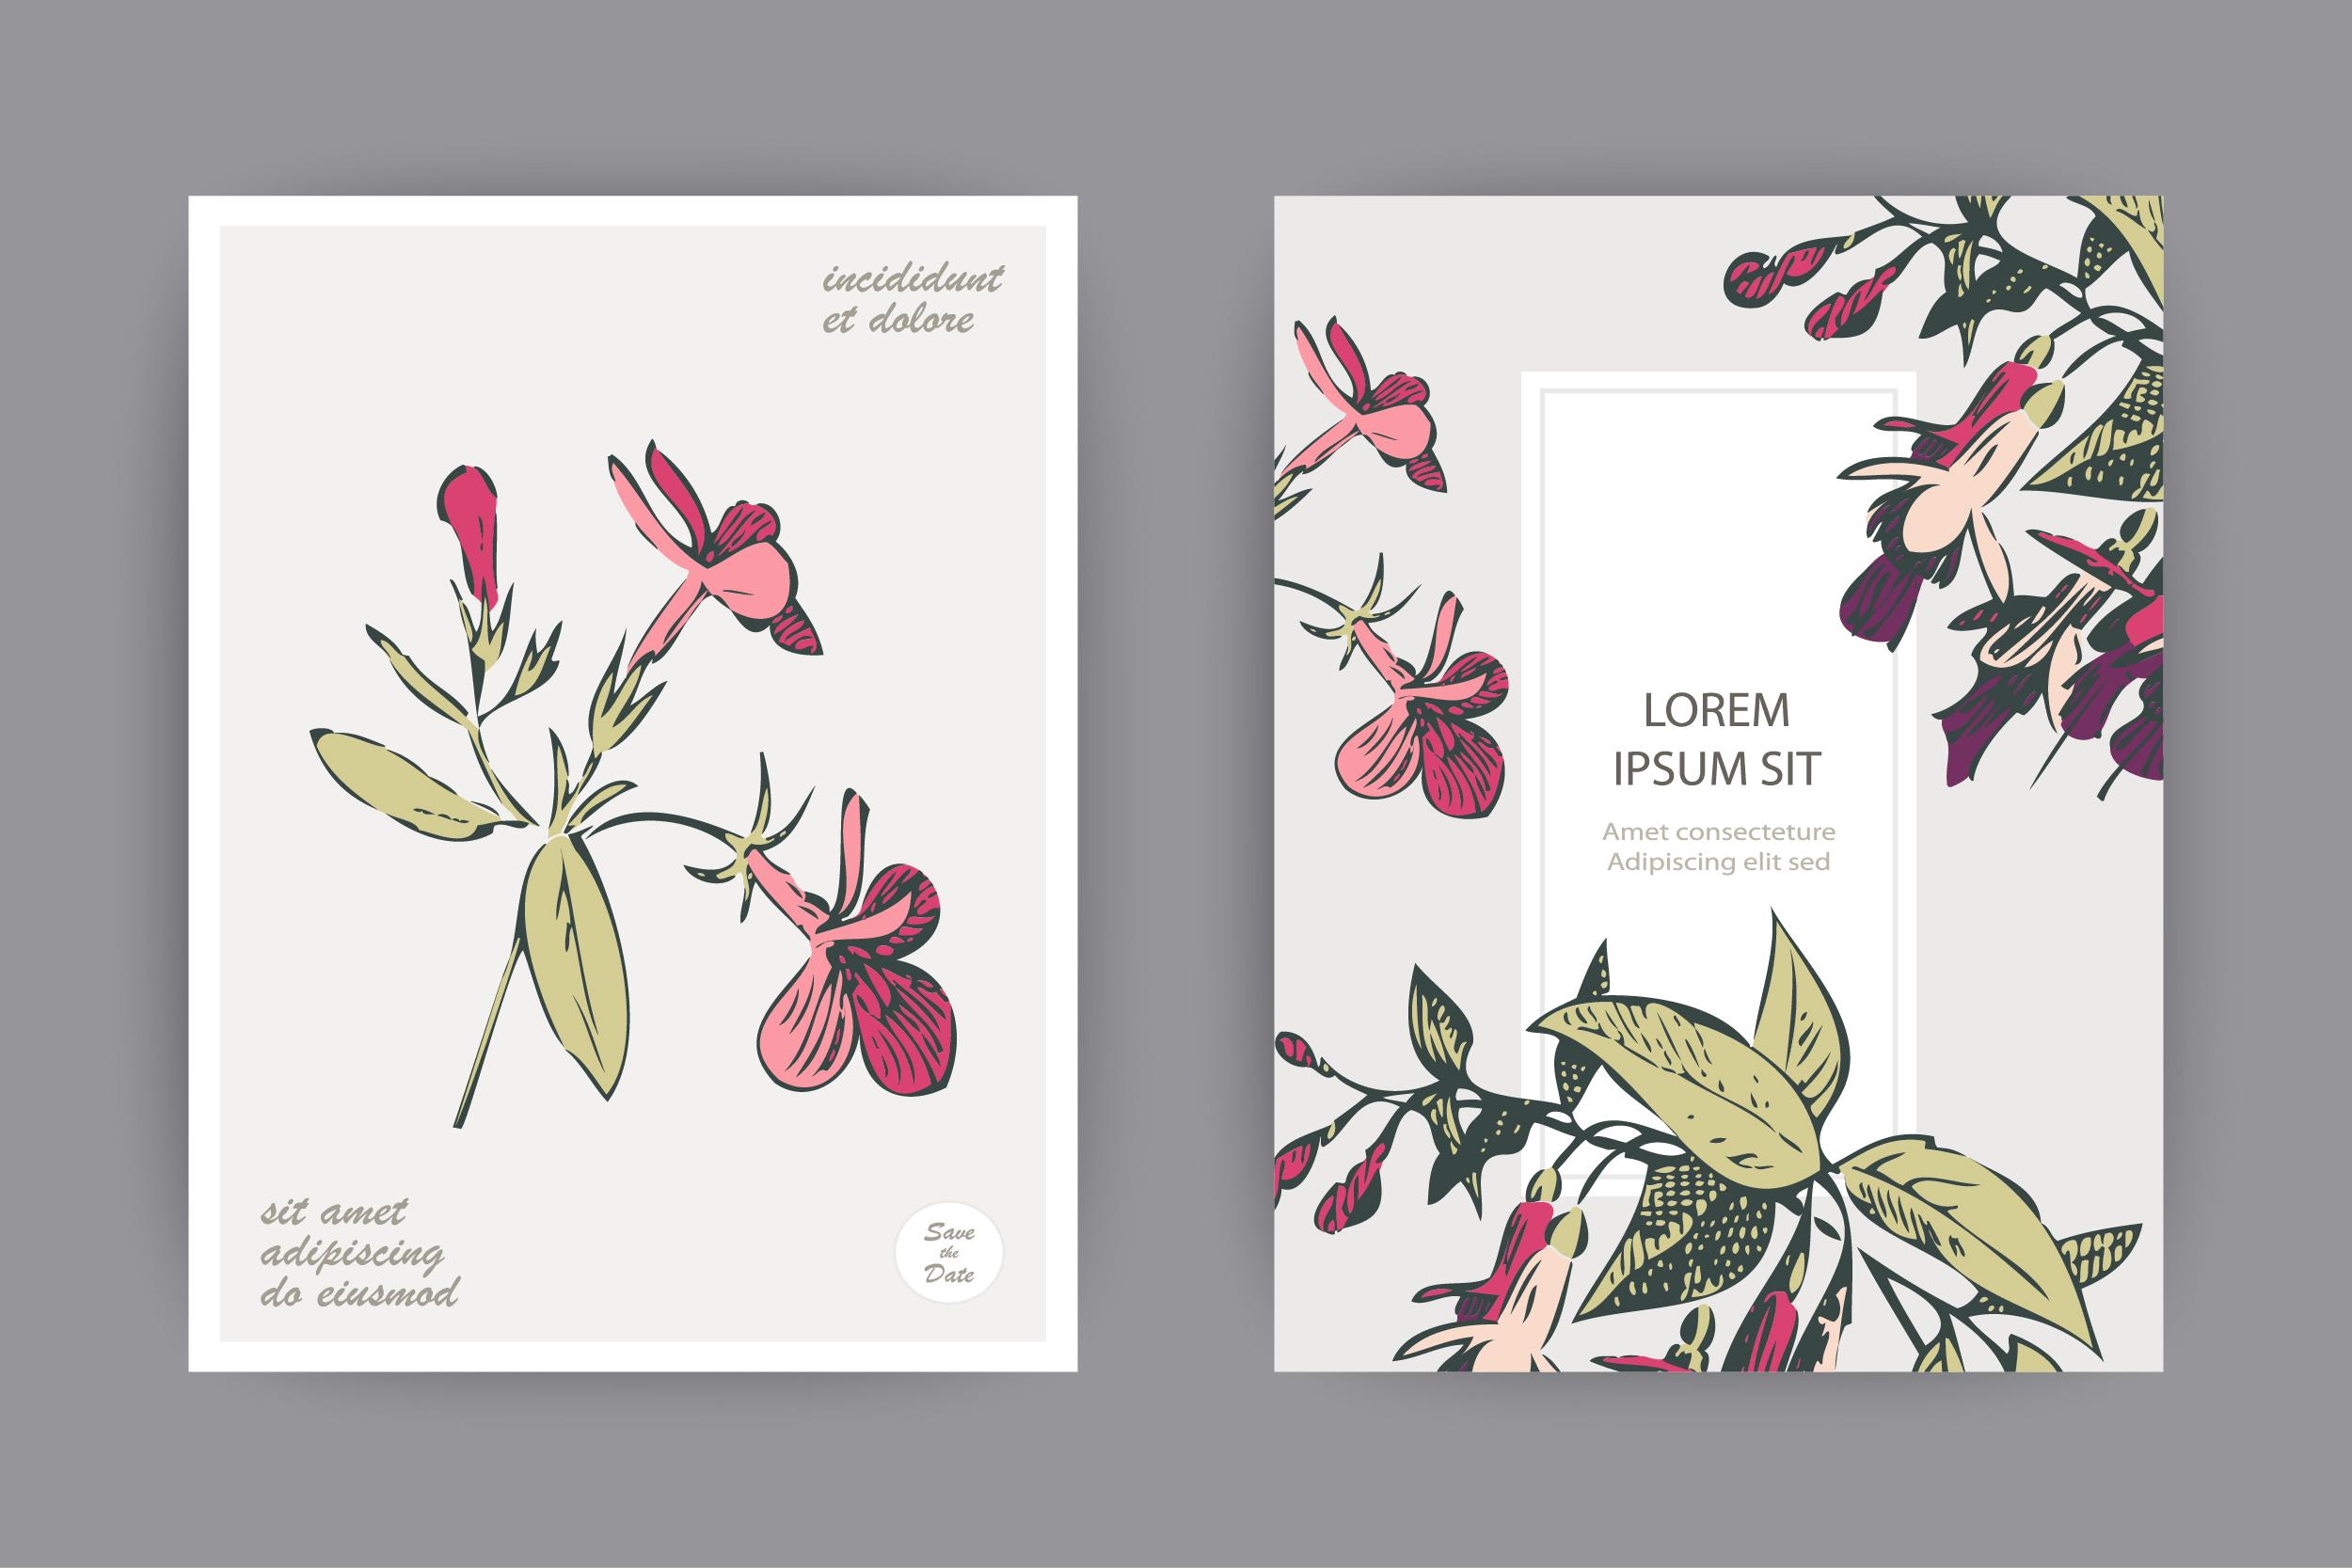 Fuchsia flower templates for card, invitation, wedding example image 2